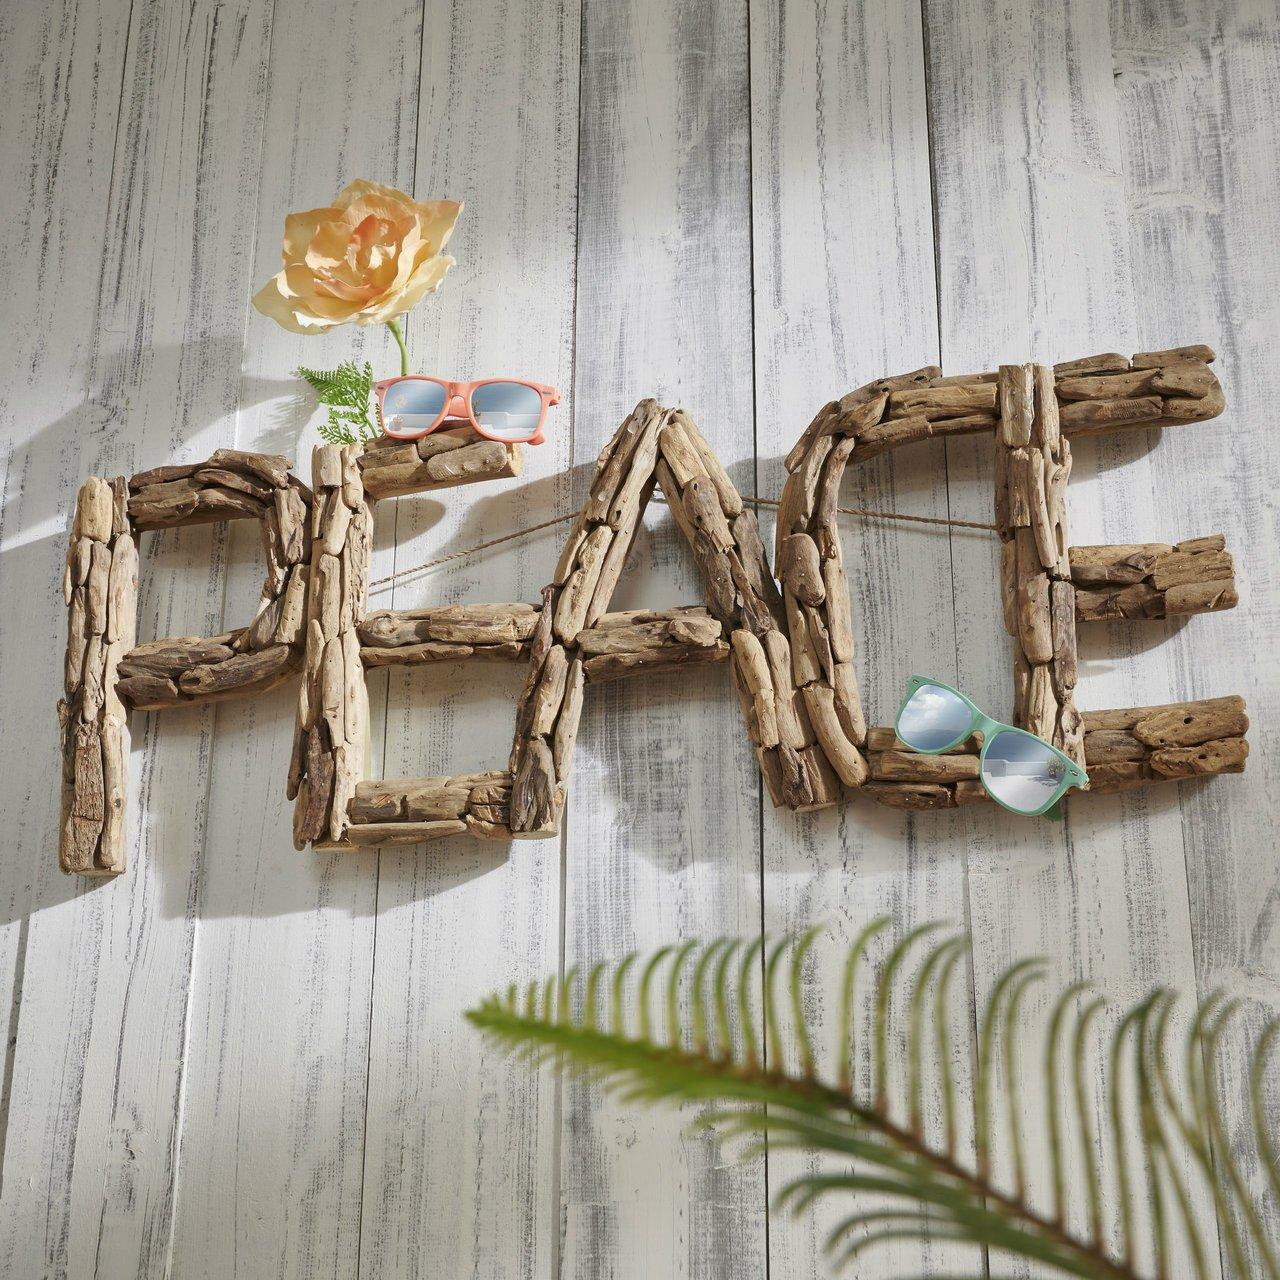 Faktorei Unikat Wand-Dekoration Peace Teakholz